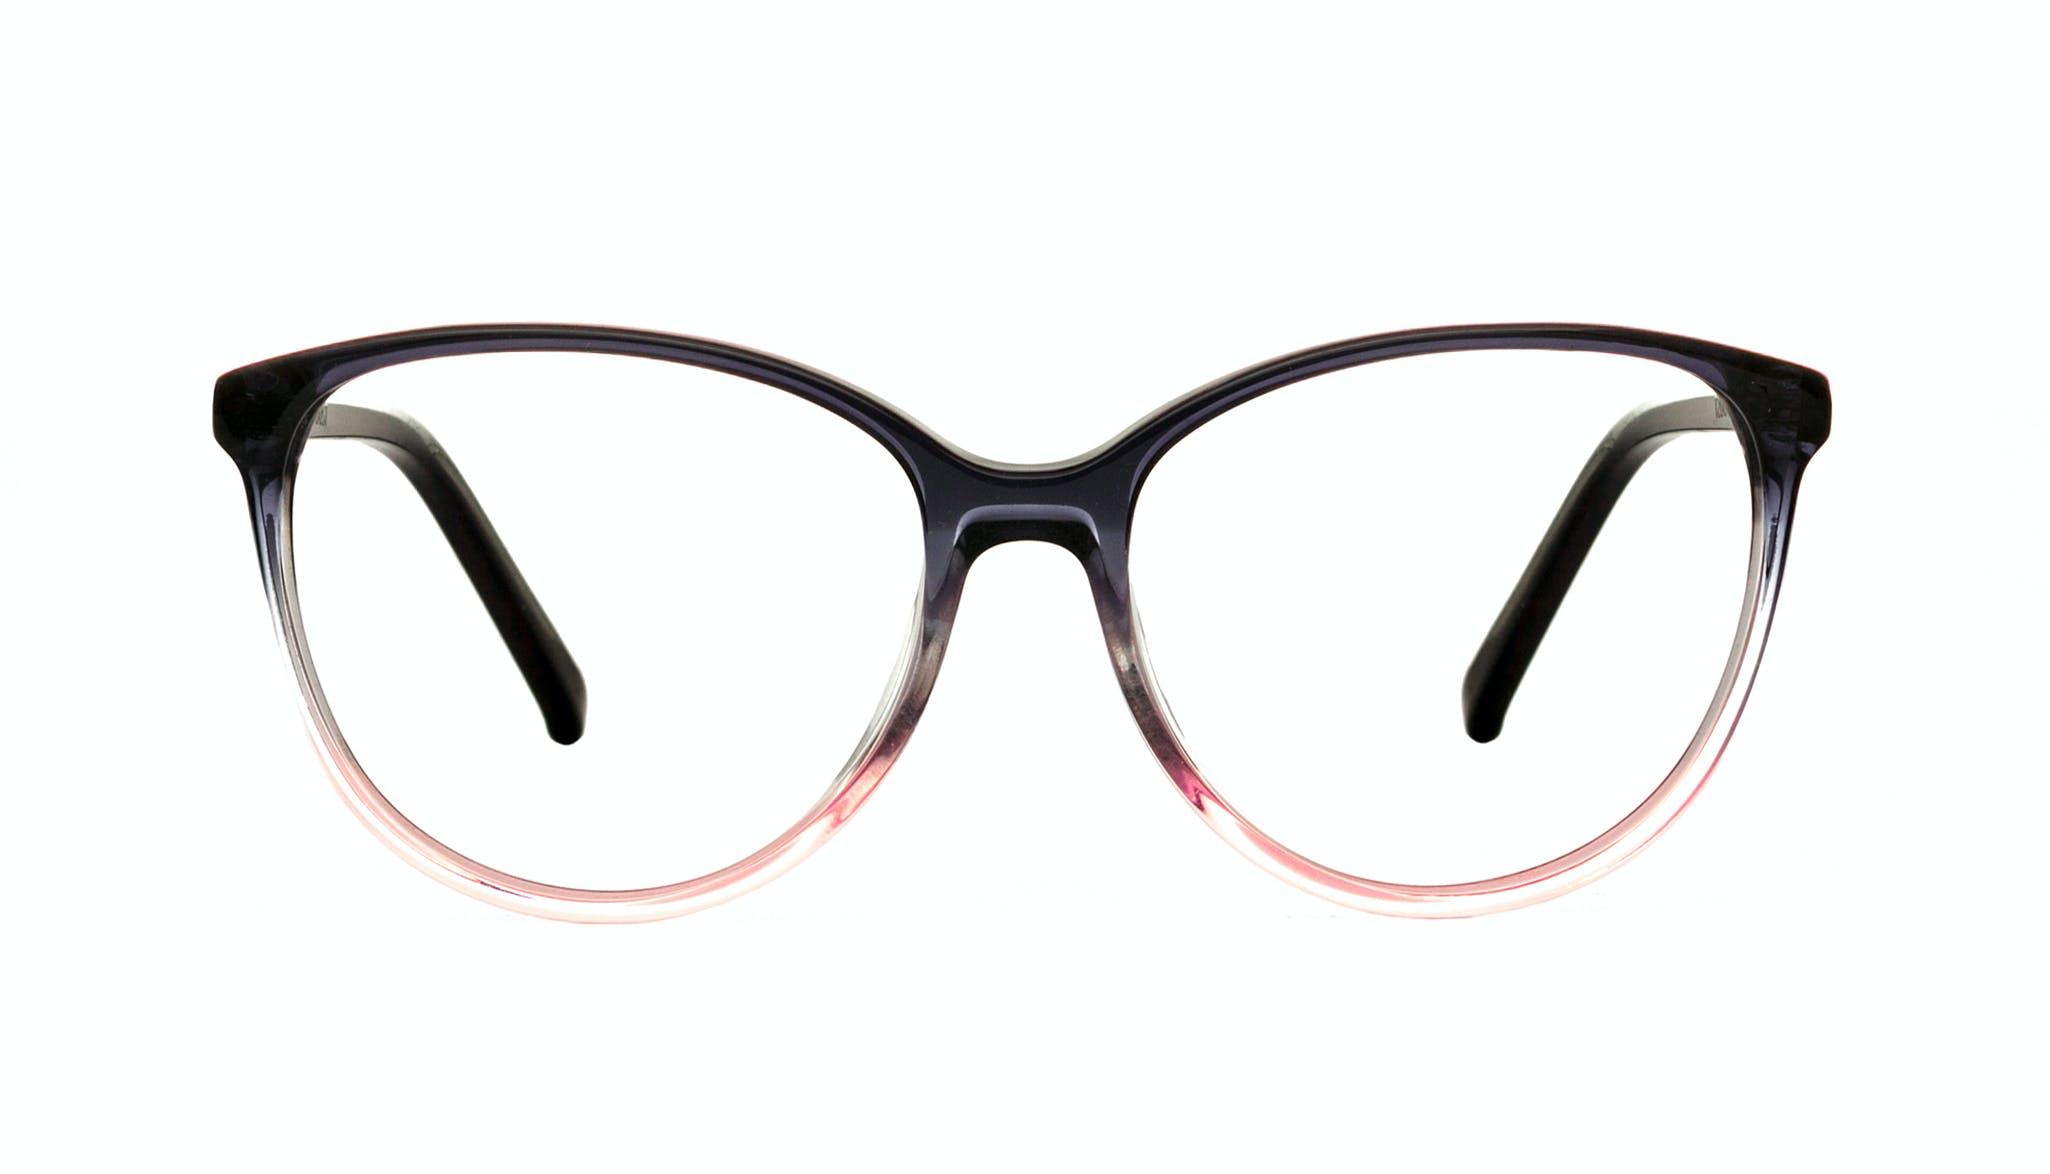 Affordable Fashion Glasses Round Eyeglasses Women Imagine Pink Dust Front